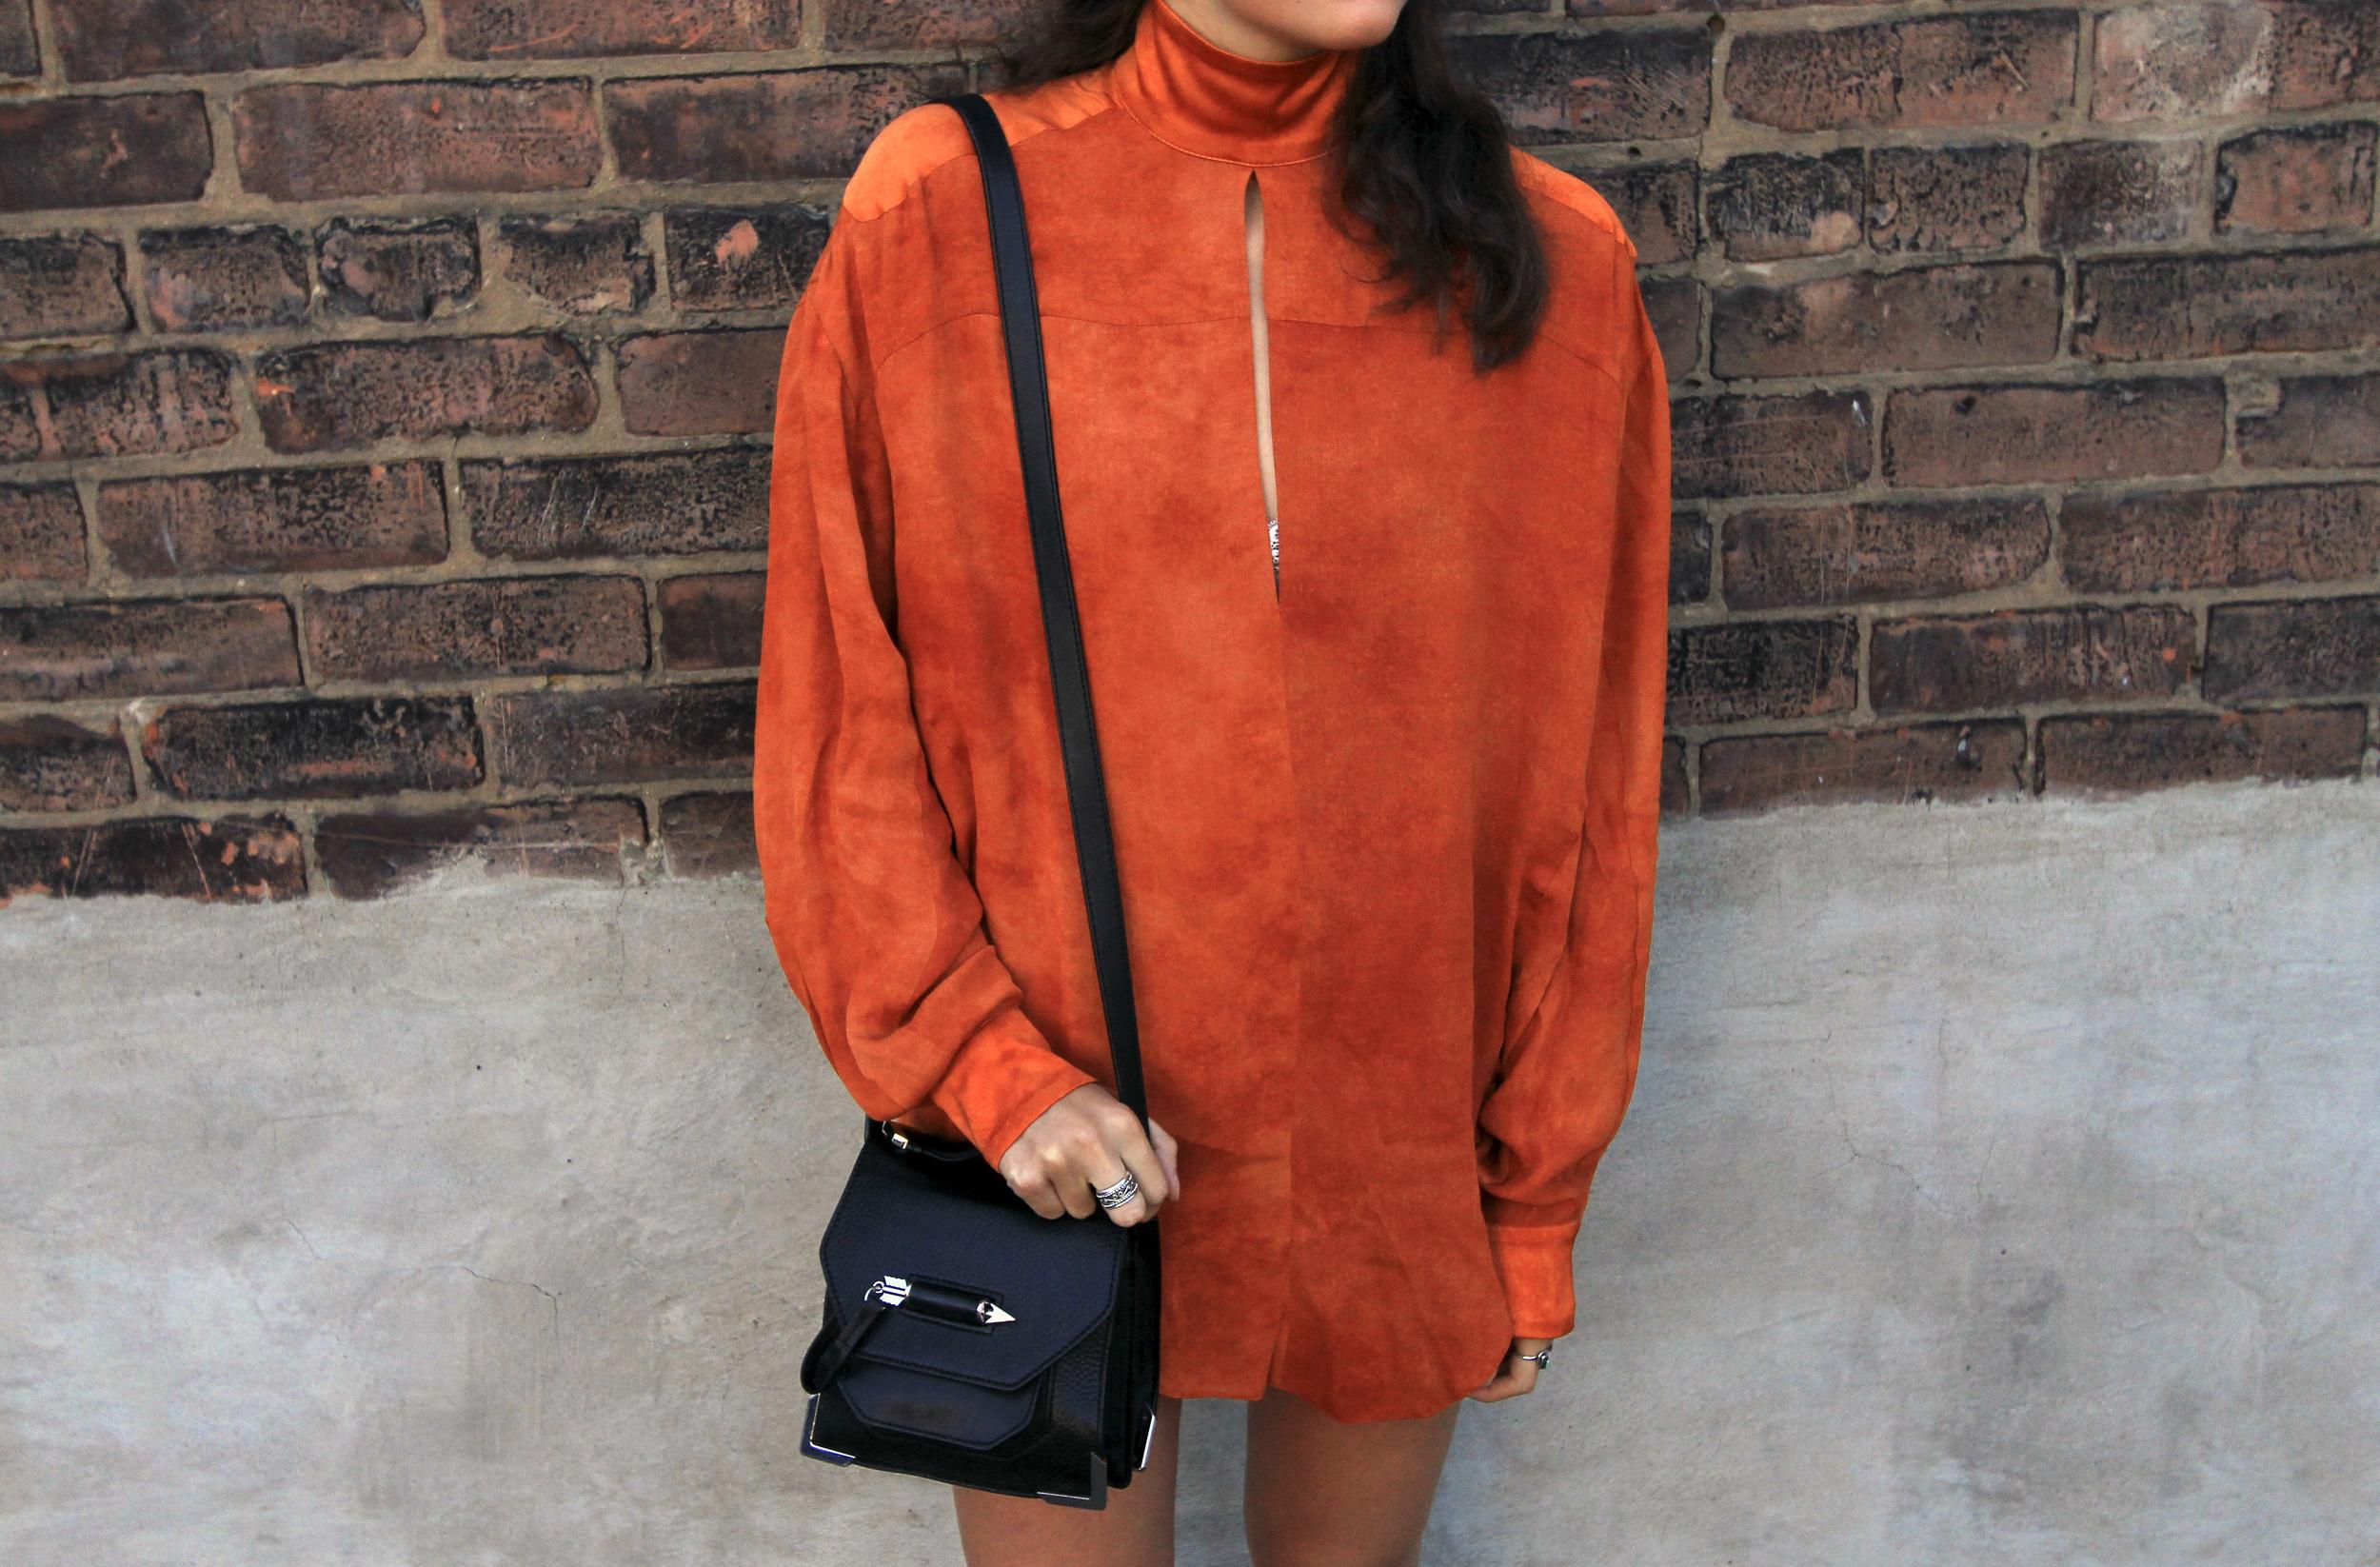 hm-studio-collection-autumn-winter-orange-tunic-slit-neck.jpg